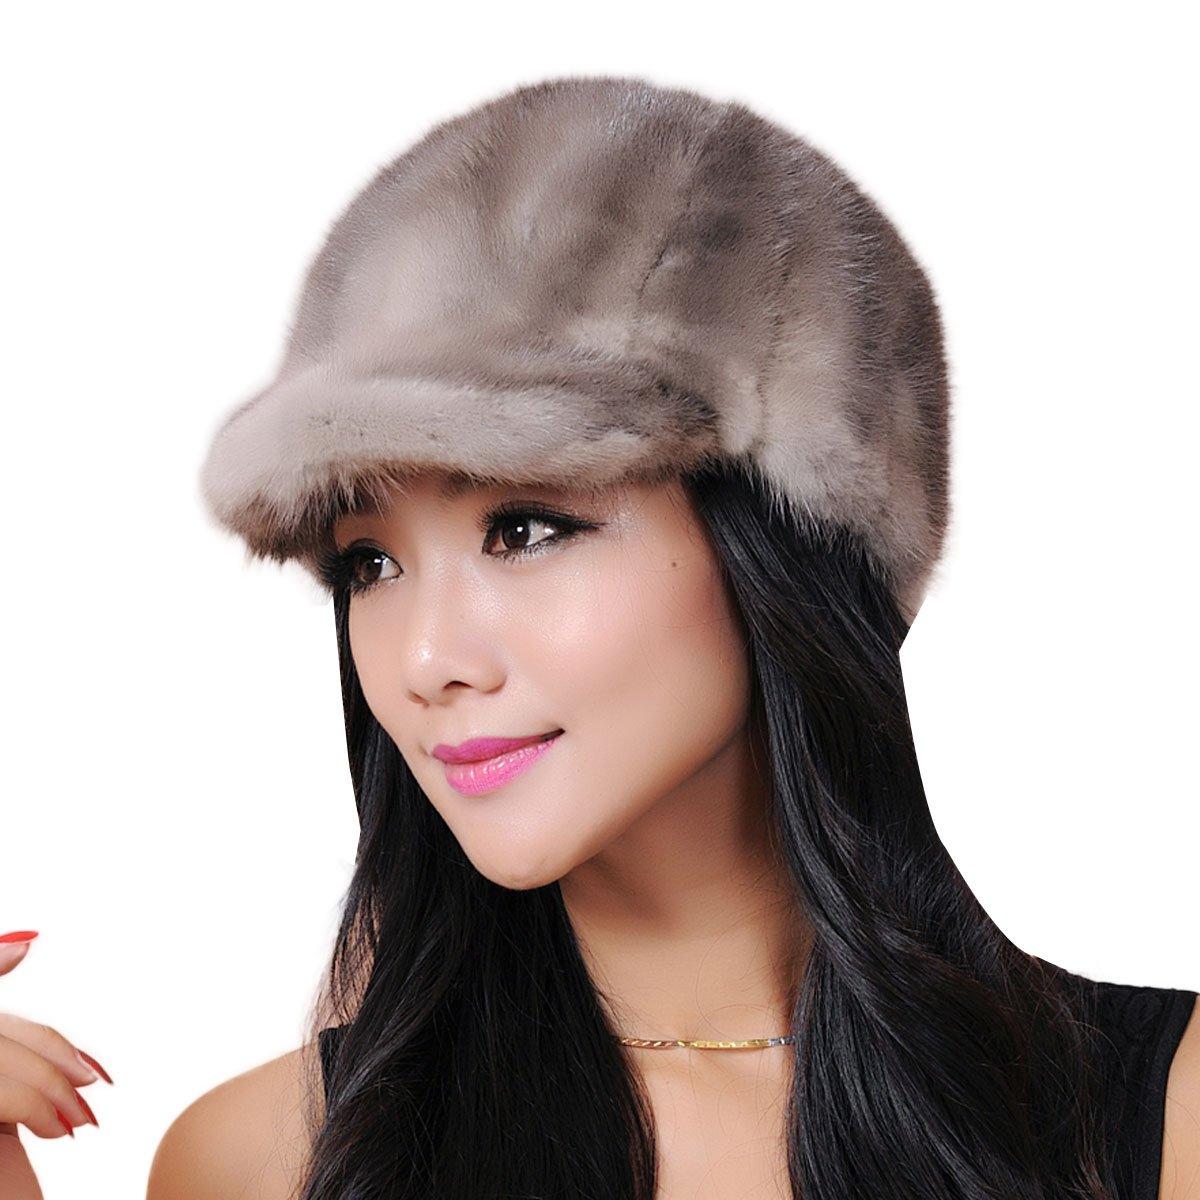 URSFUR Women's Mink Fur Riding Hats Multicolors (Gray)